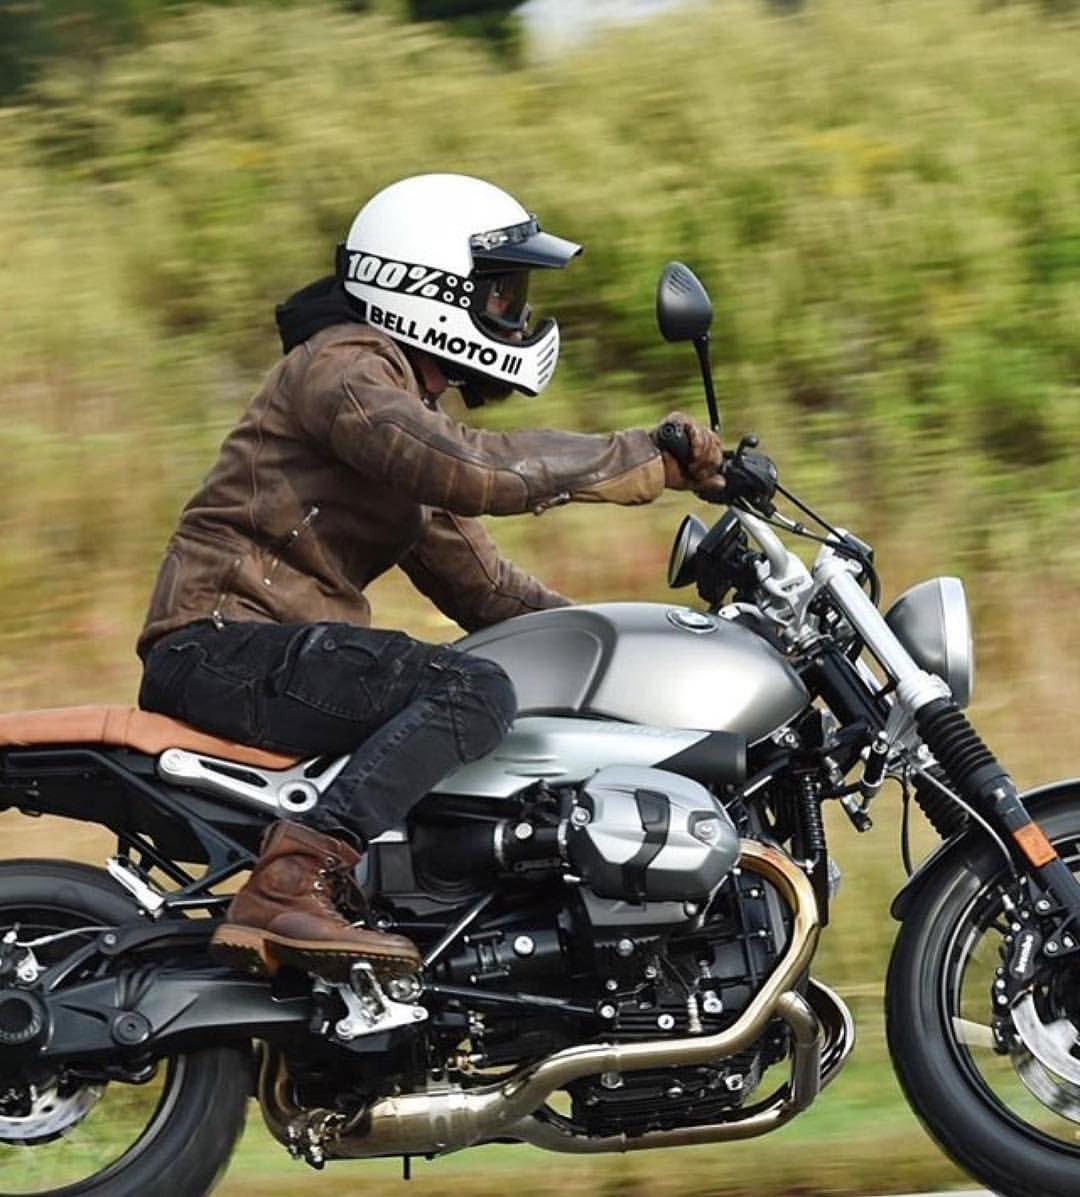 uglybros motorpool riding jeans, bell moto3 helmet and 100